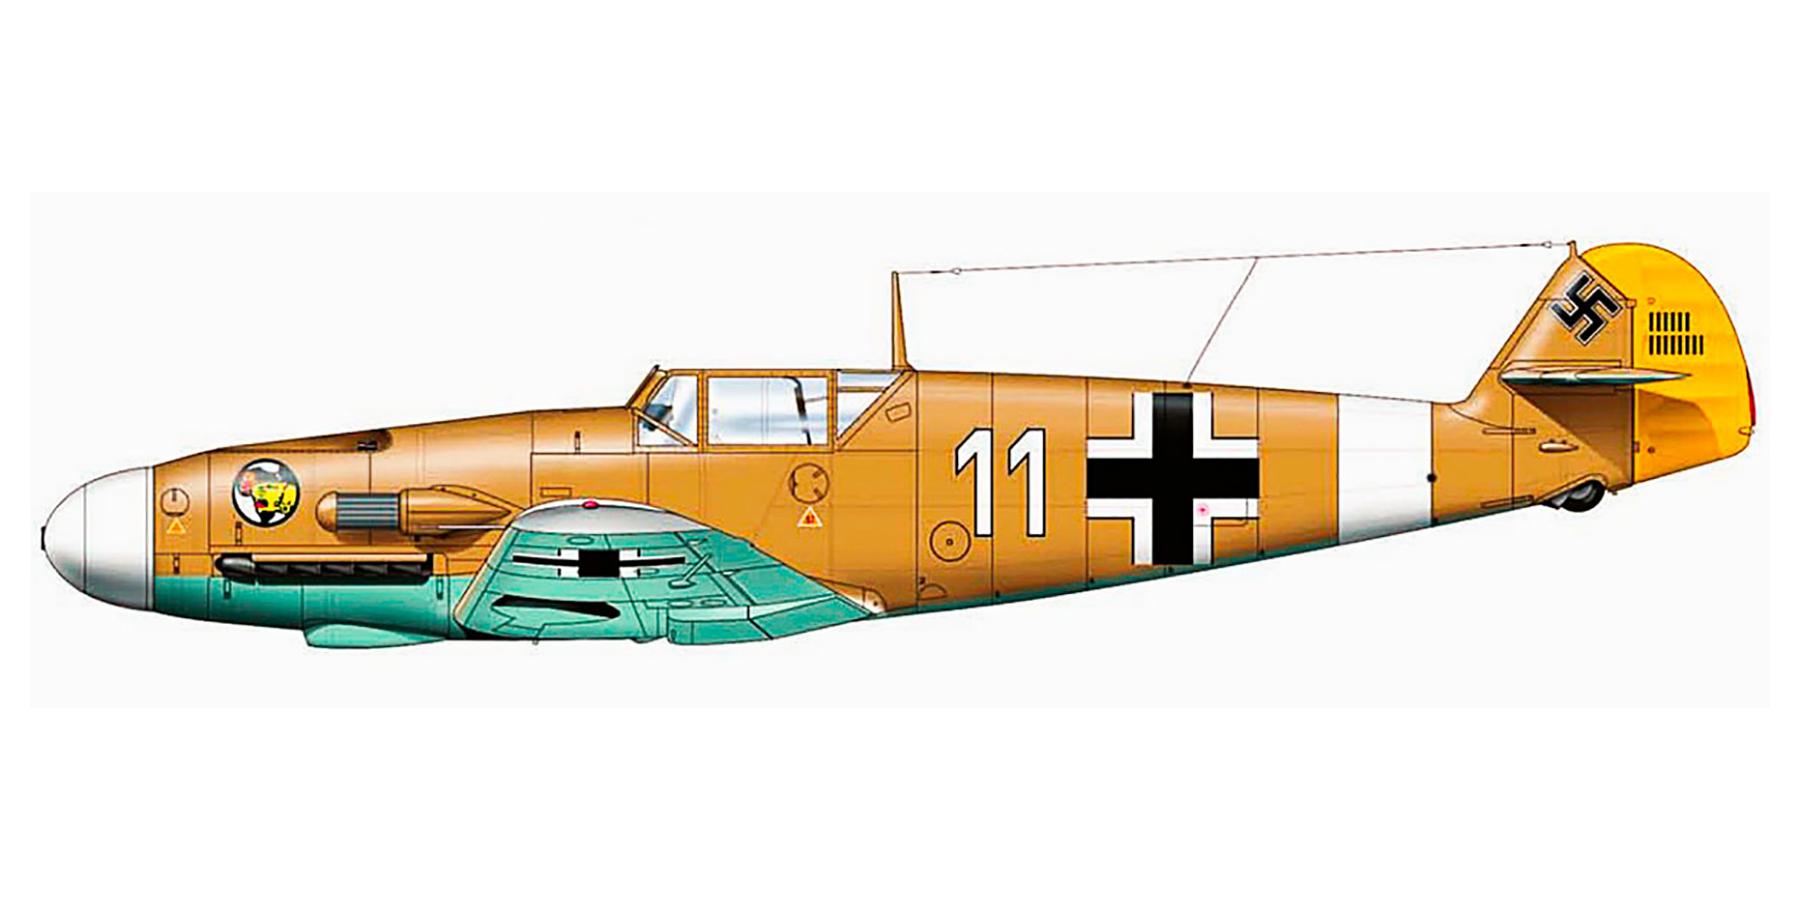 Messerschmitt Bf 109F4Trop 1.JG27 White 11 Albert Espenlaub El Adem Dec 1941 0A